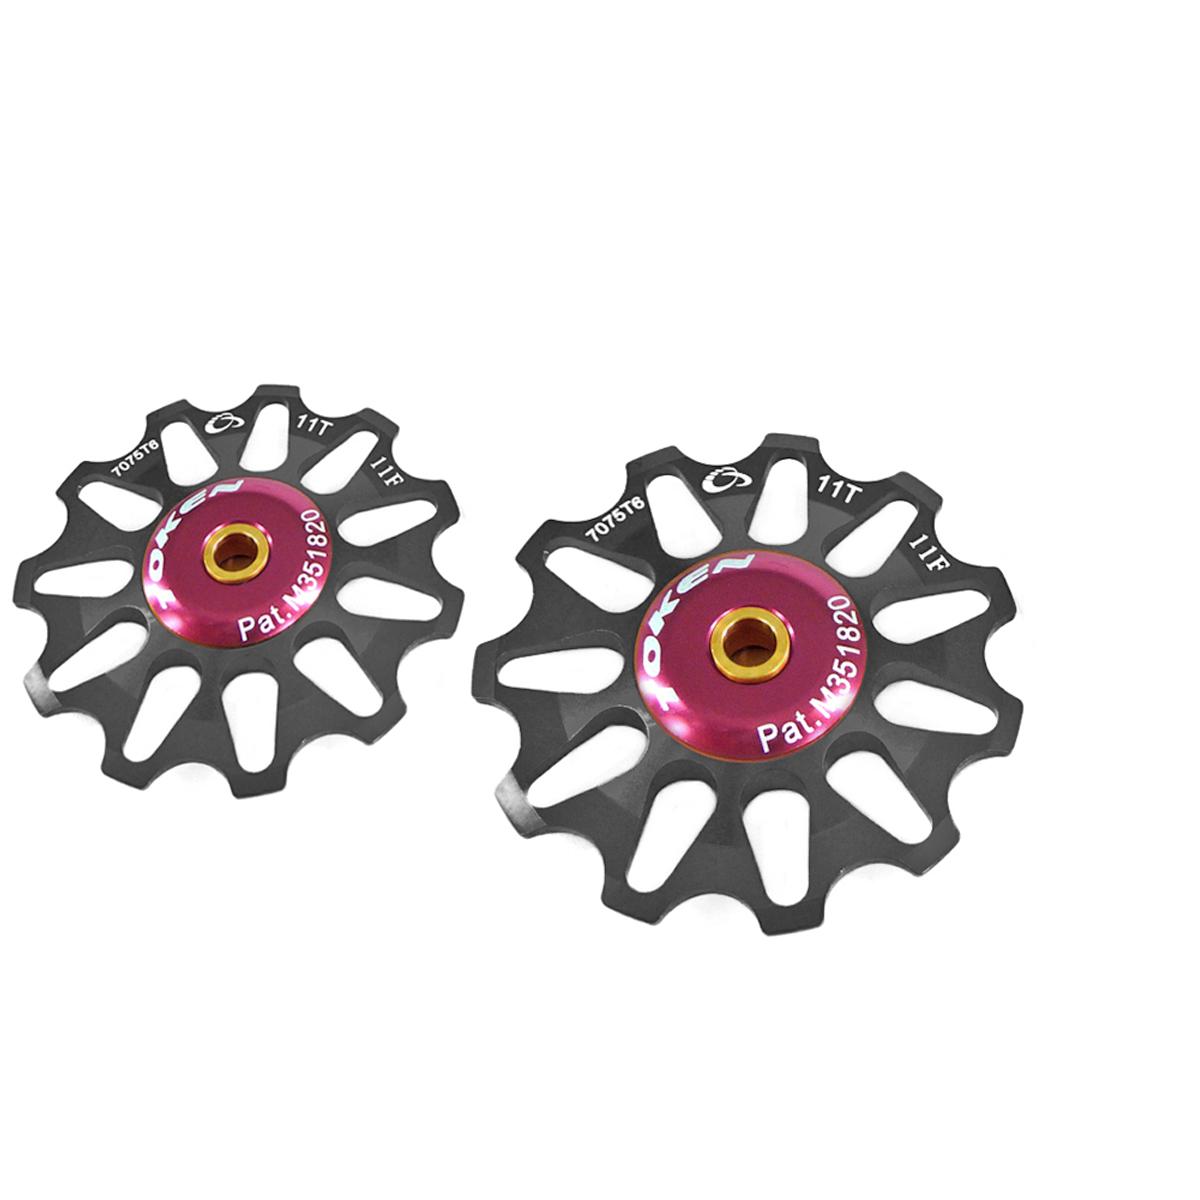 Galets de dérailleur Token 11 dents comp. Shimano/Campagnolo/SRAM XO Noir